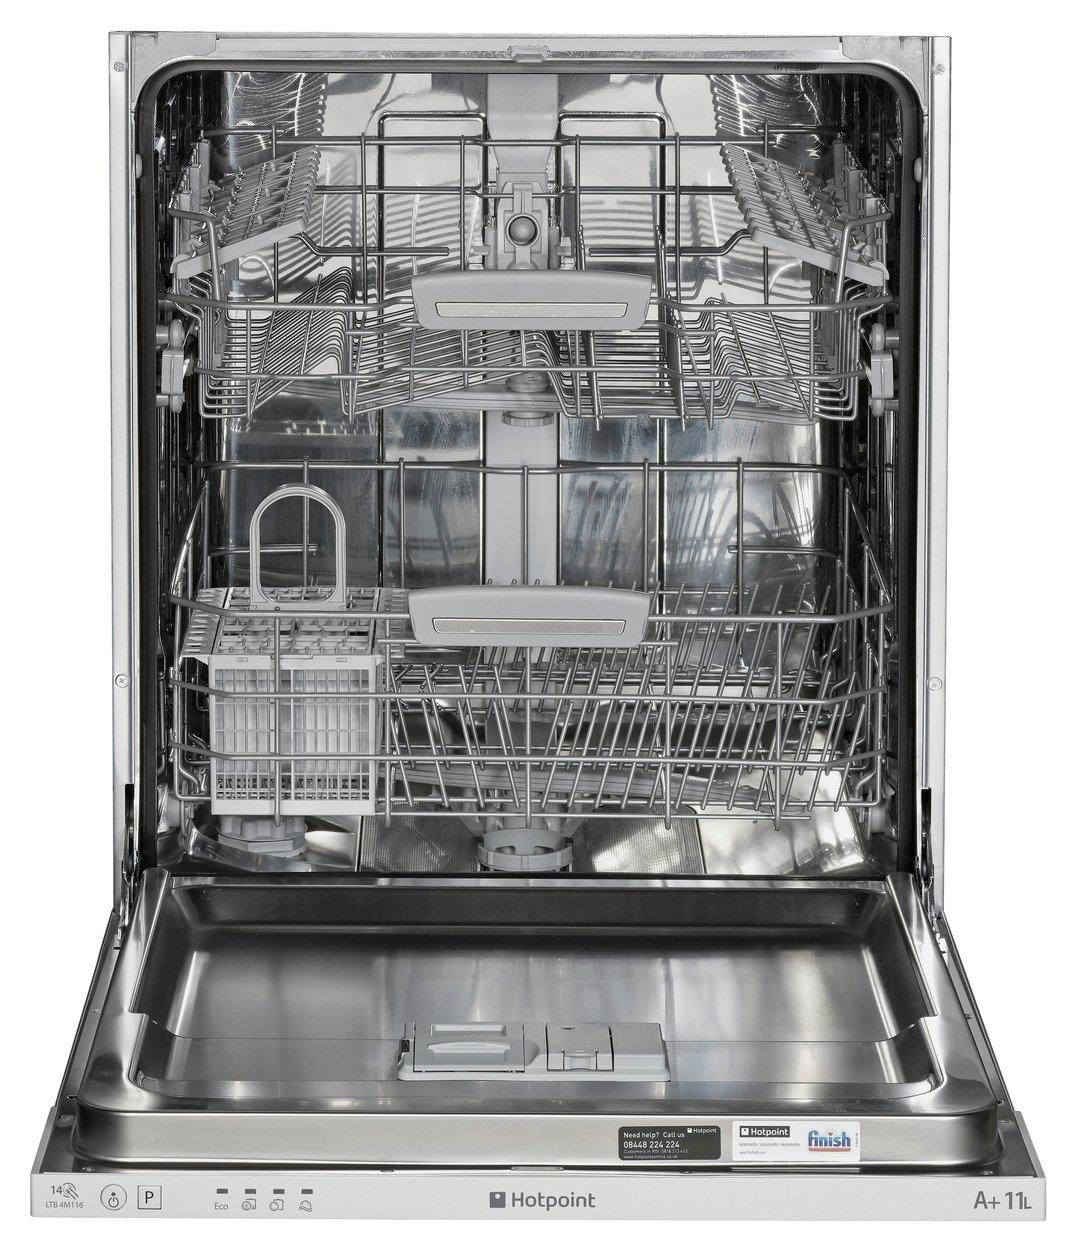 Hotpoint LTB4B019 Full Size Integrated Dishwasher - White